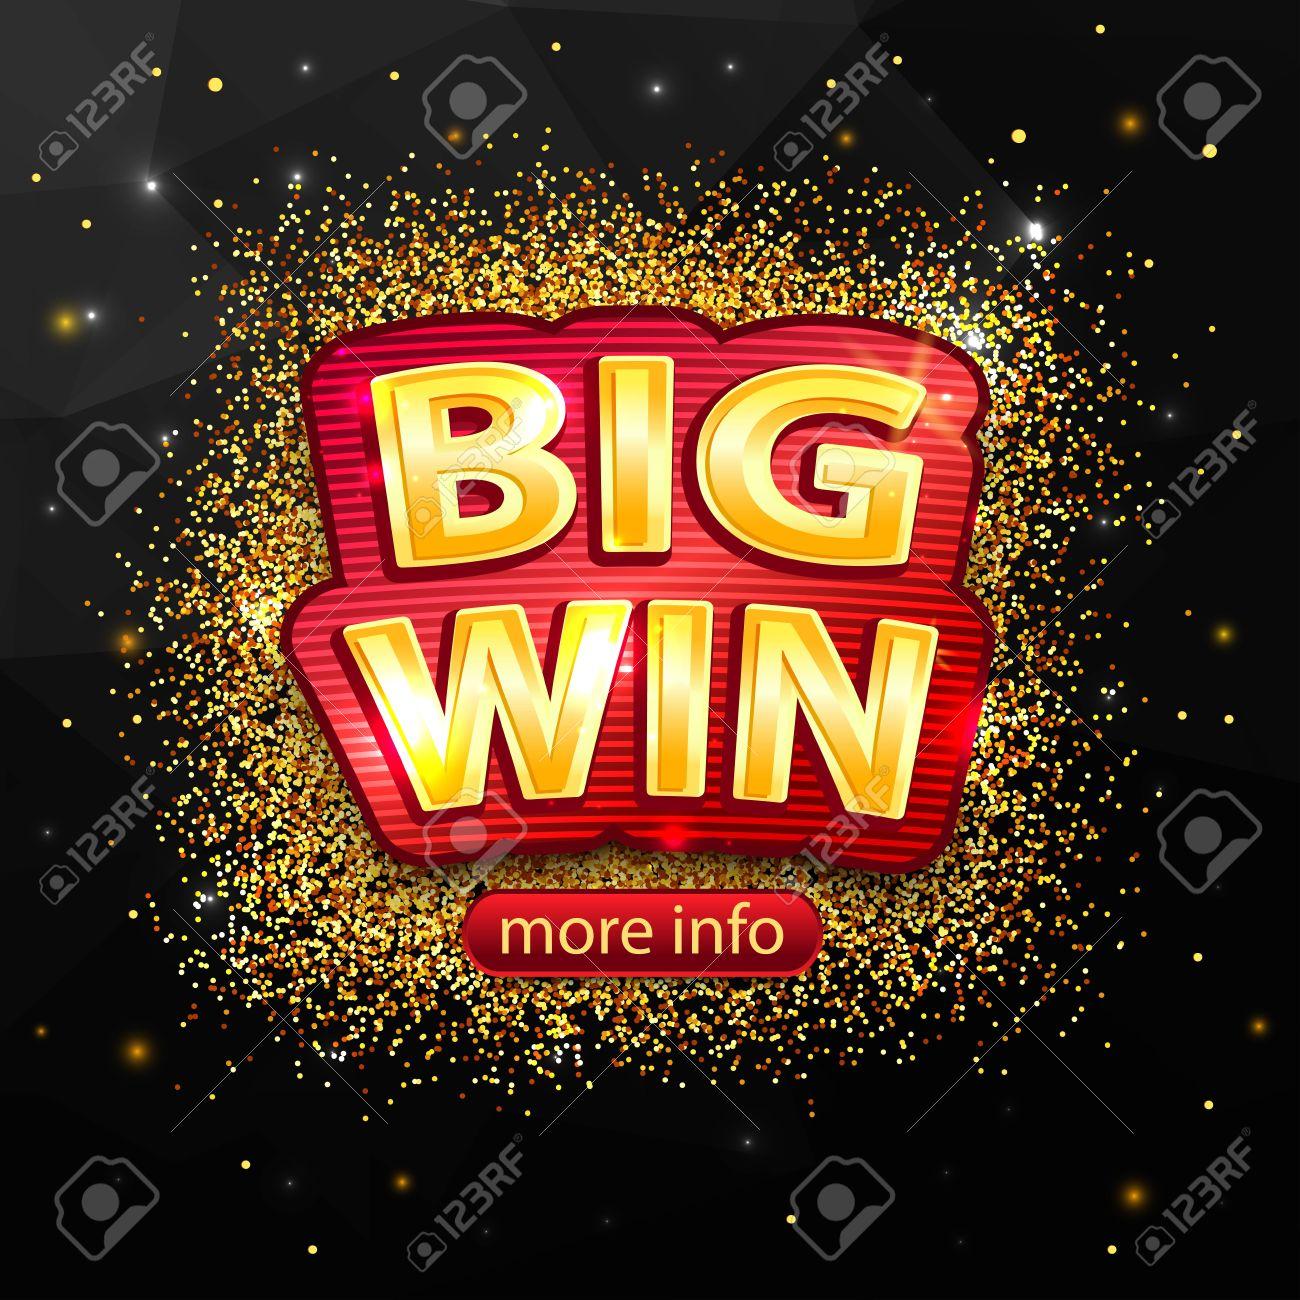 Big Win Background For Online Casino Poker Roulette Slot